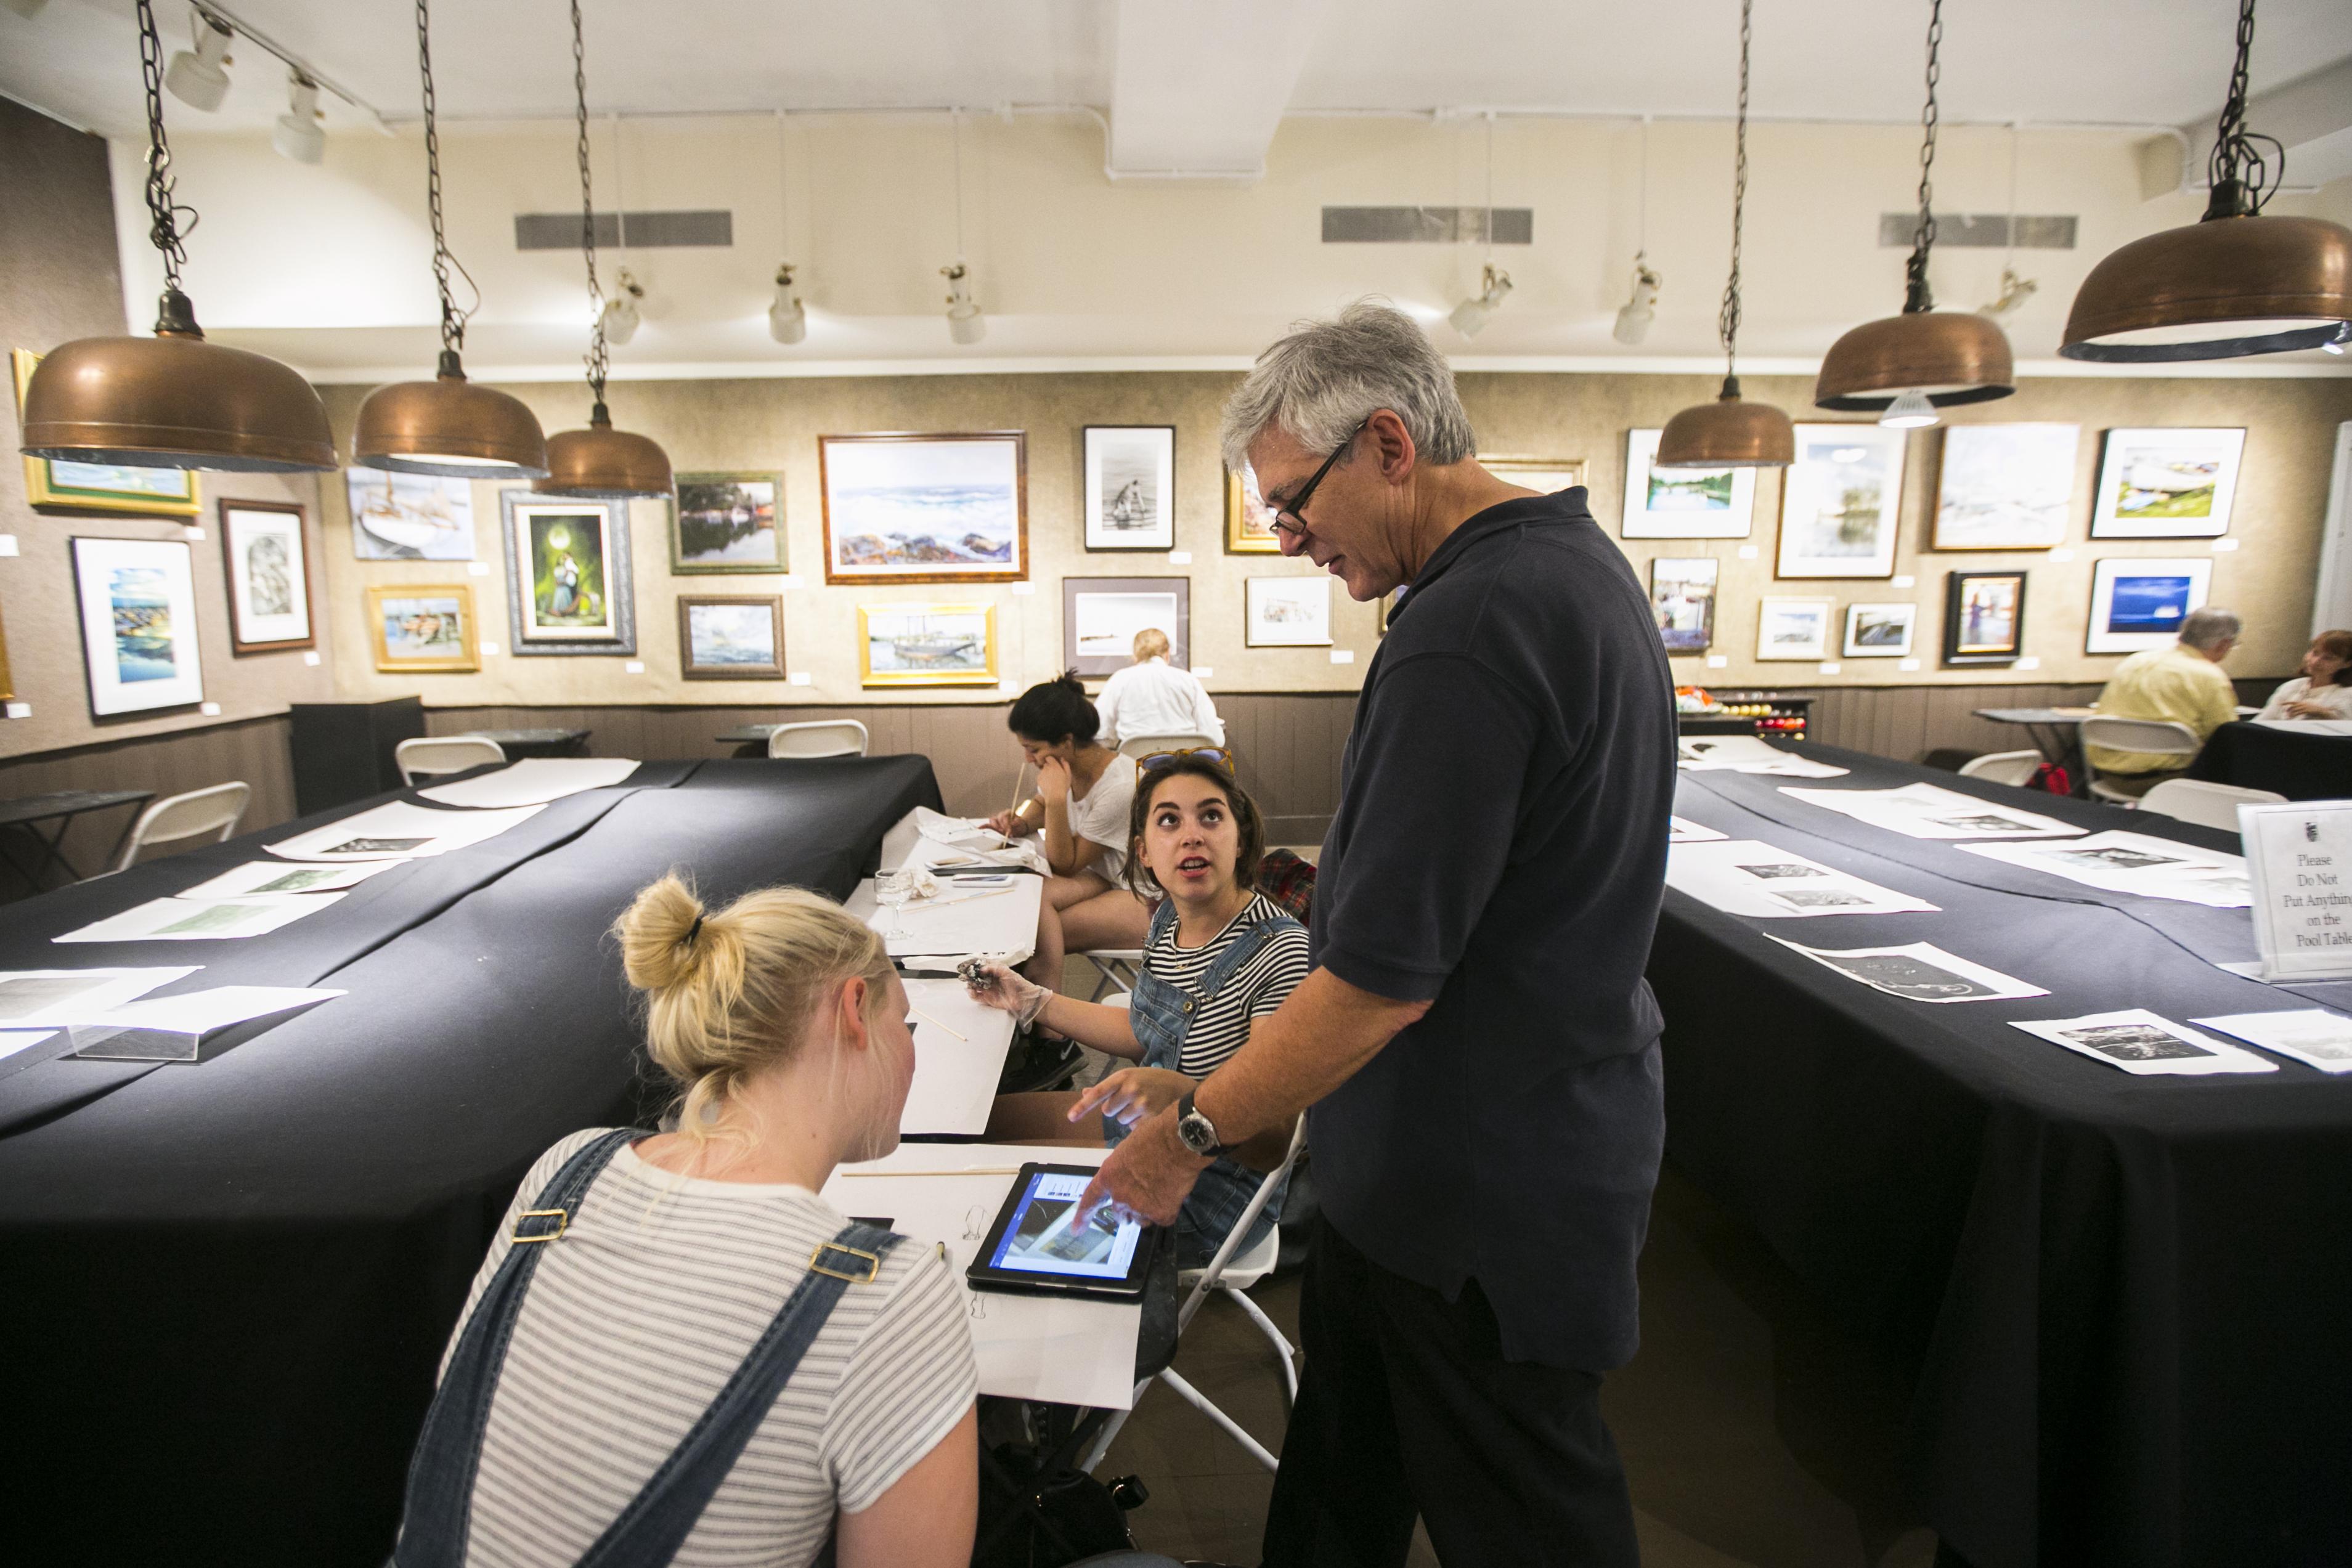 Salmagundi Club President, Robert W. Pillsbury hosts the club's monthly Monotype Party at the Salmagundi Club in Greenwich Village, New York on July 12, 2016. (Samira Bouaou/Epoch Times)